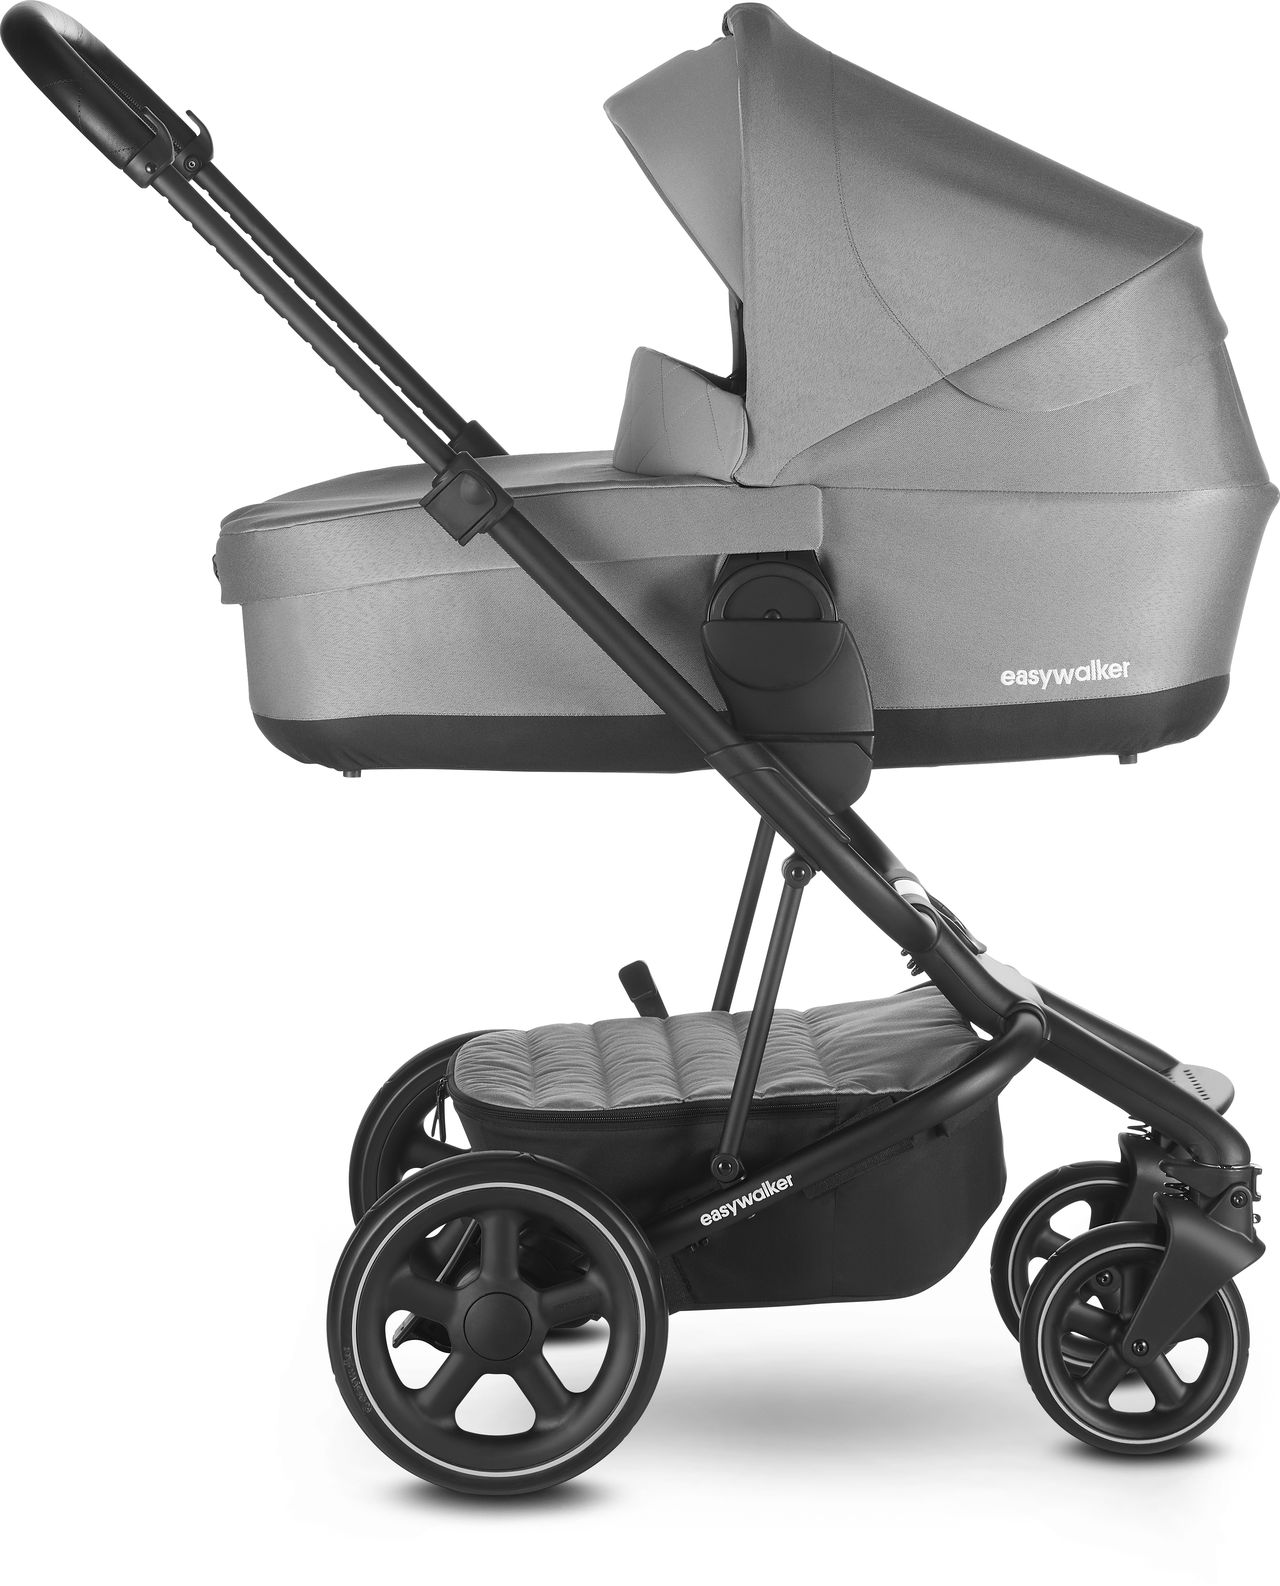 Harvey 2 Premium Easywalker Kinderwagen in Berlin kaufen - Kleine Fabriek